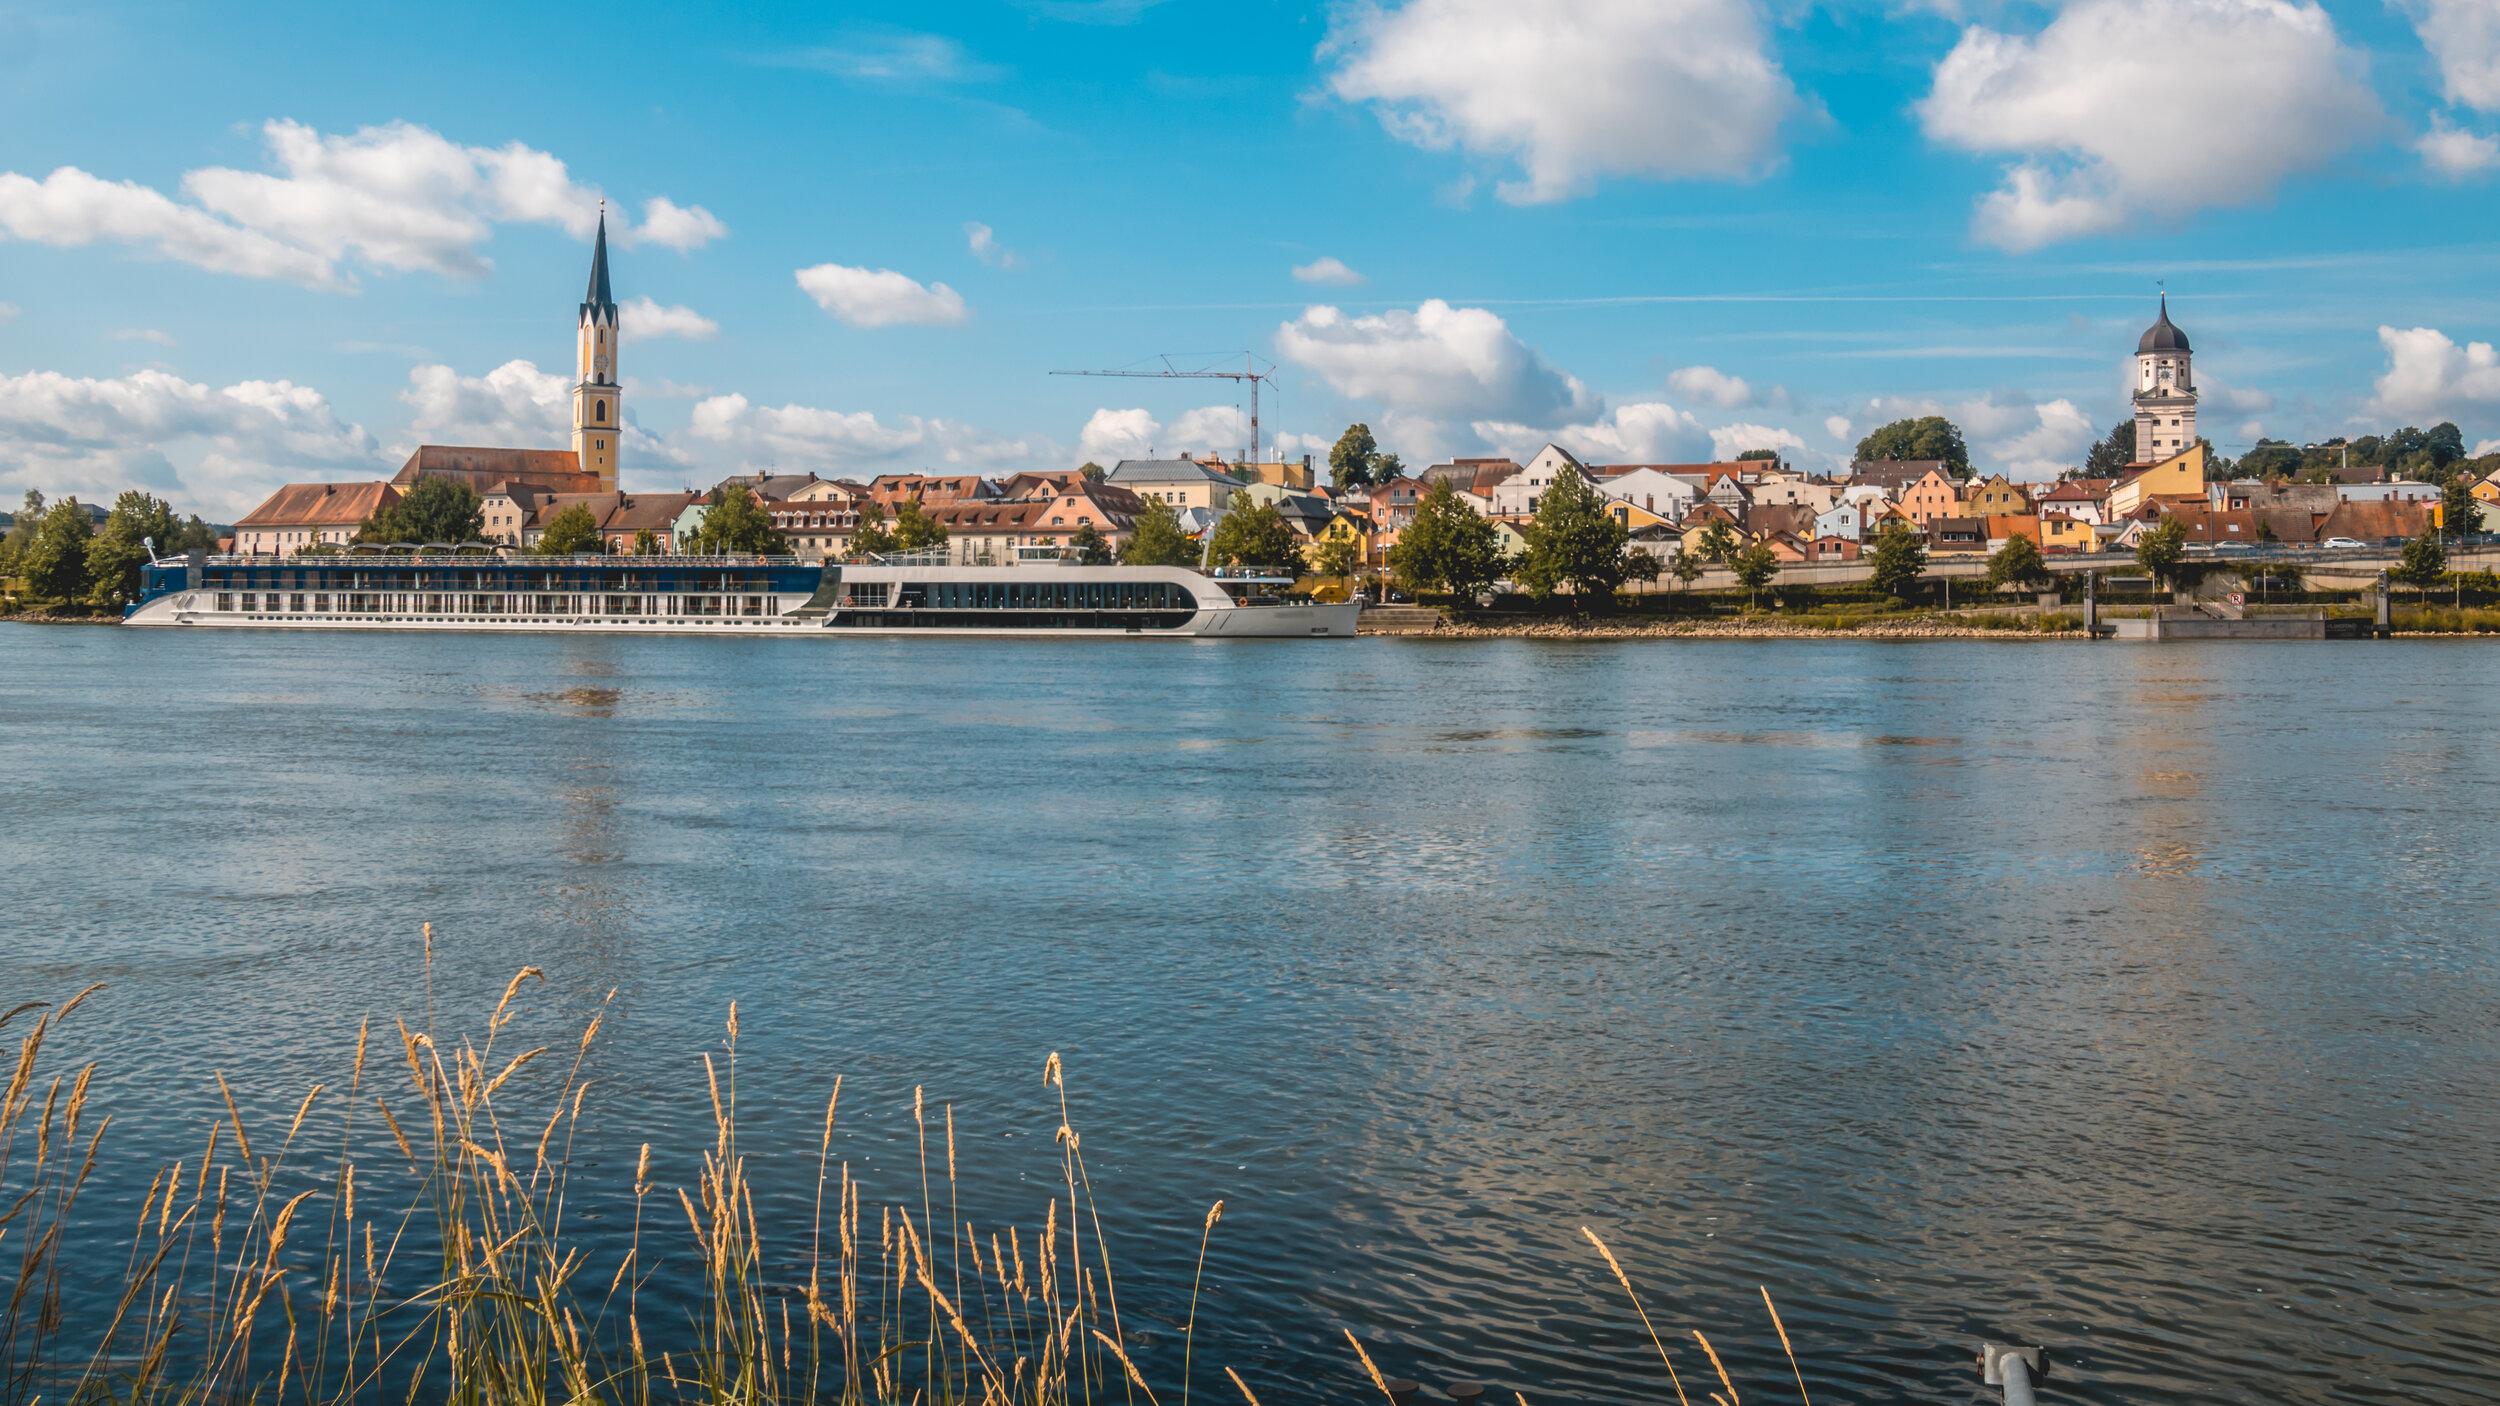 Beautiful reflections near Vilshofen - Danube - Bavaria - Germany